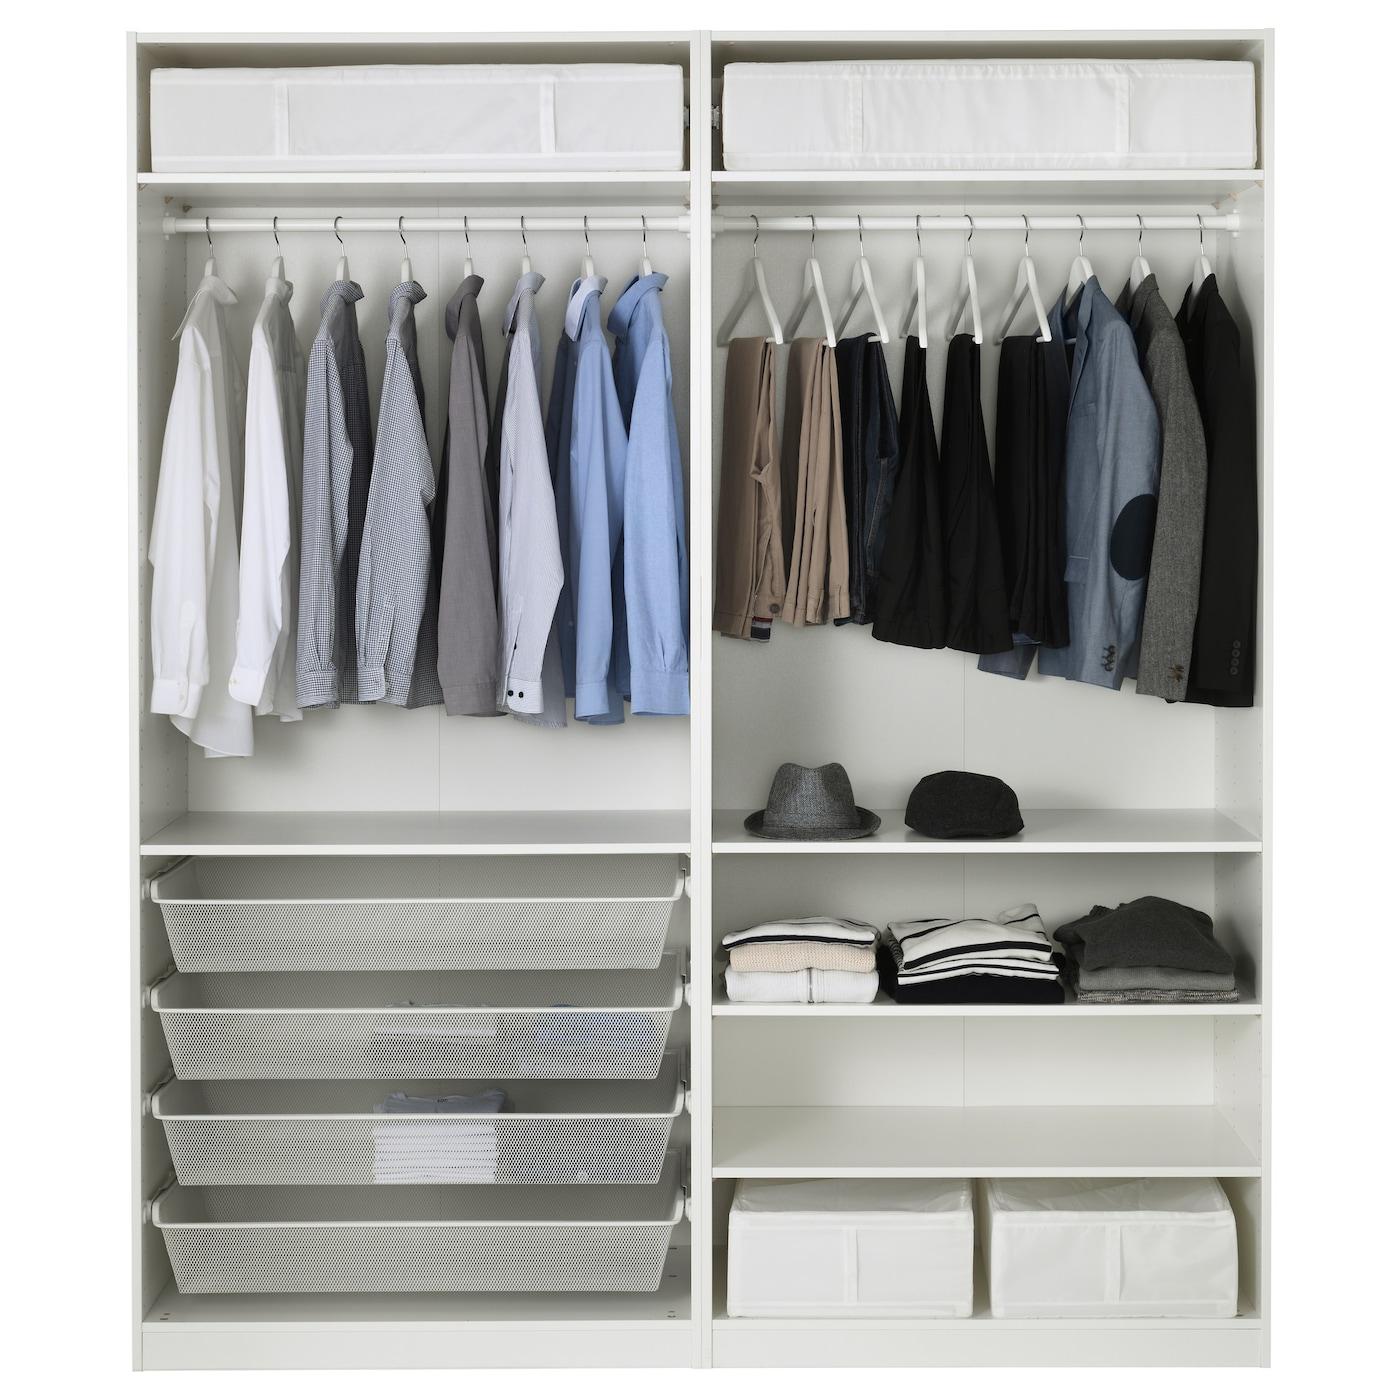 pax kledingkast wit bergsfjord wit 200x66x236 cm ikea. Black Bedroom Furniture Sets. Home Design Ideas